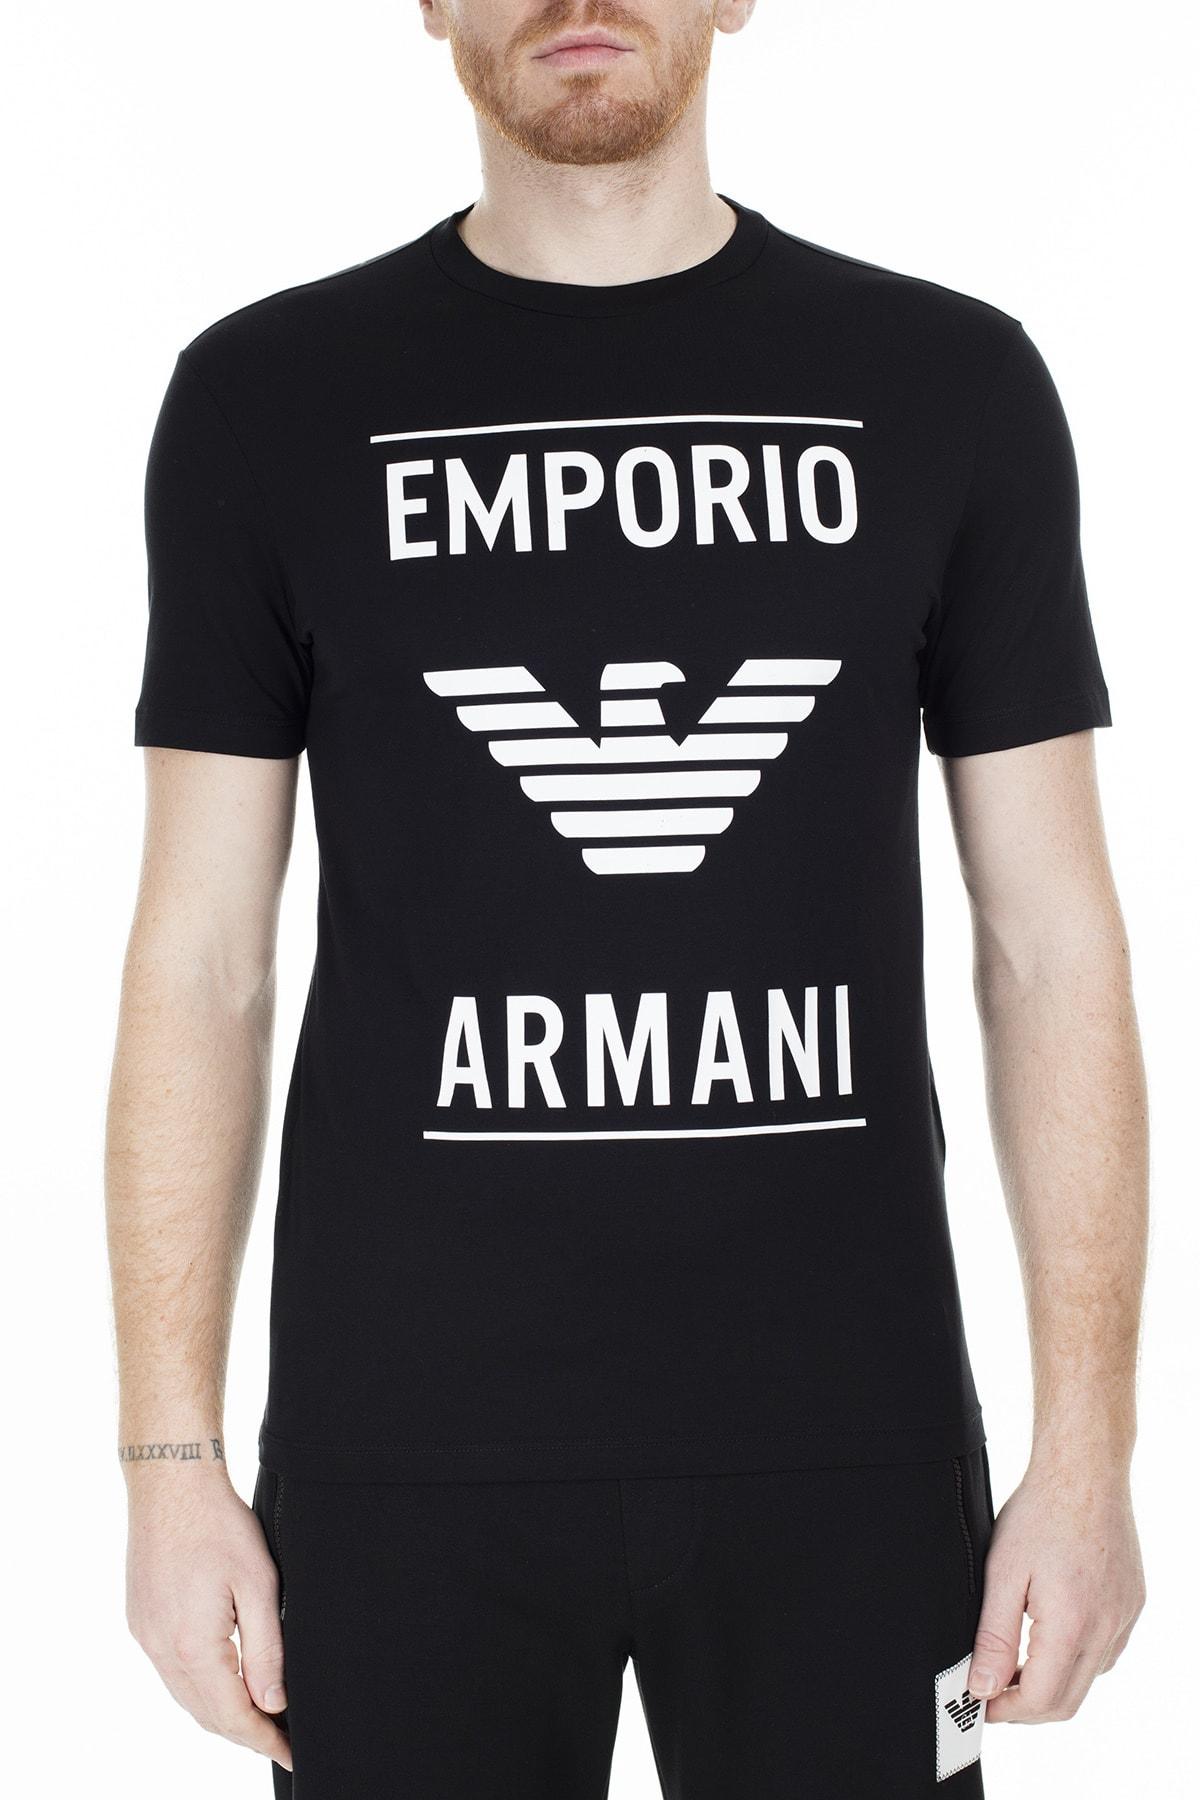 Emporio Armani T Shirt Erkek T Shirt S 6G1Te7 1Jnqz 0999 S 6G1TE7 1JNQZ 0999